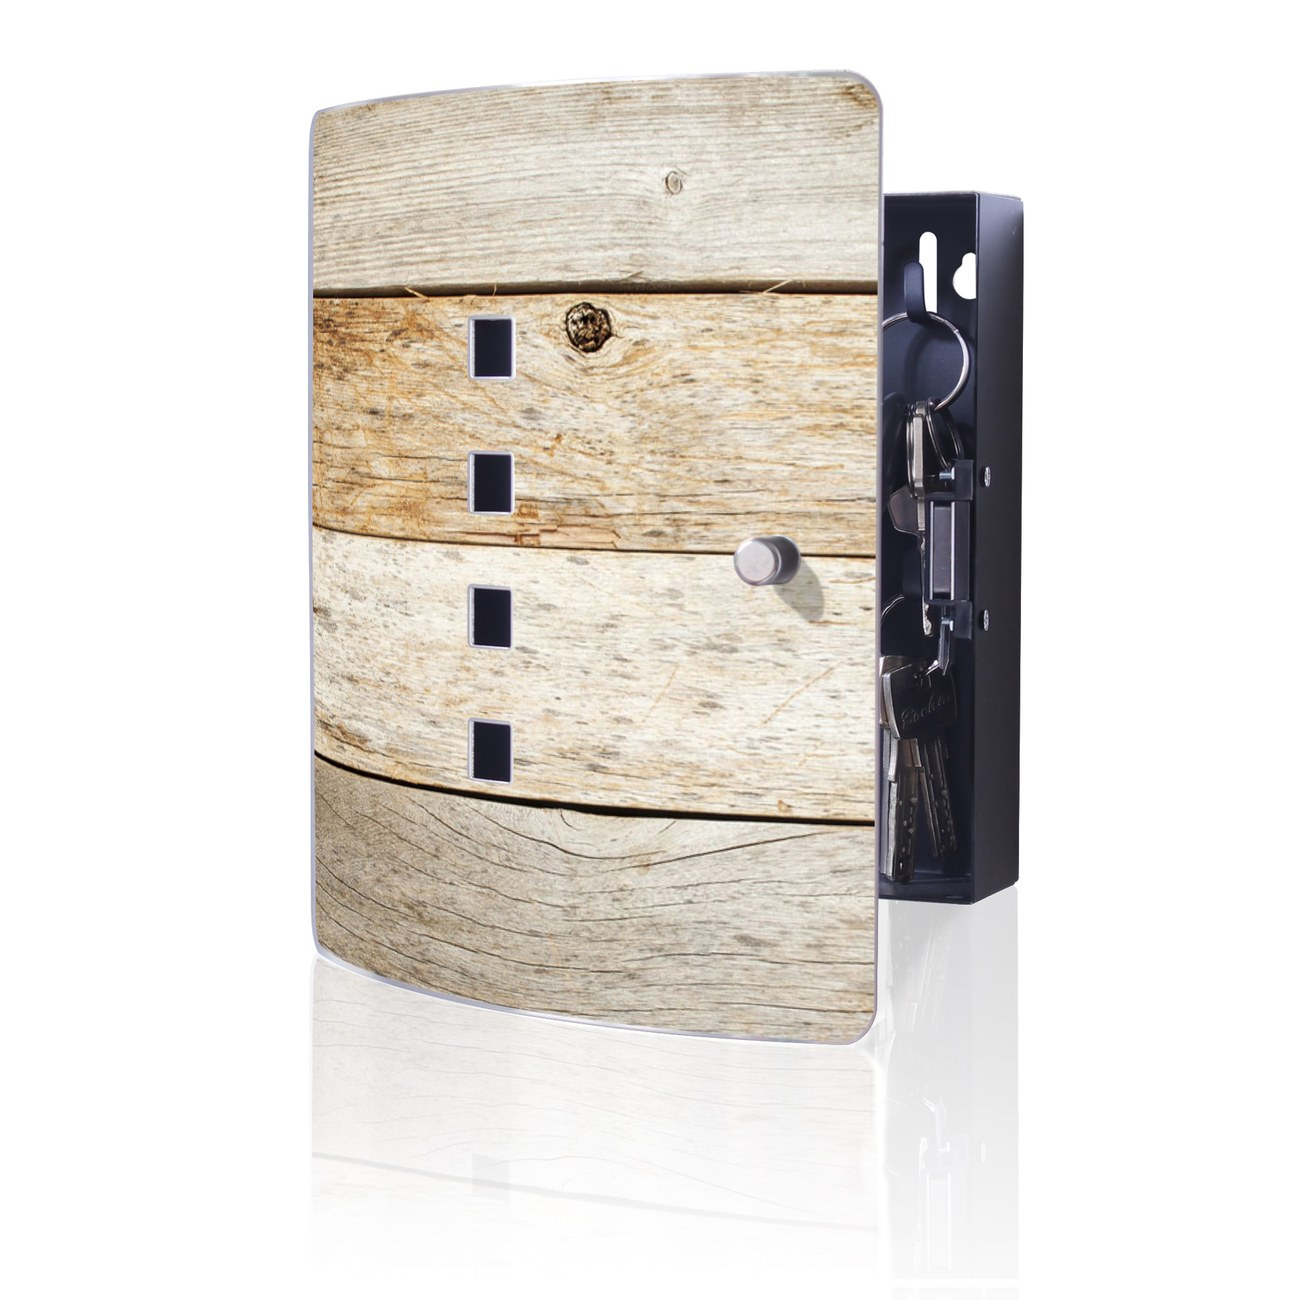 Schlüsselkasten Motiv Graues Holz